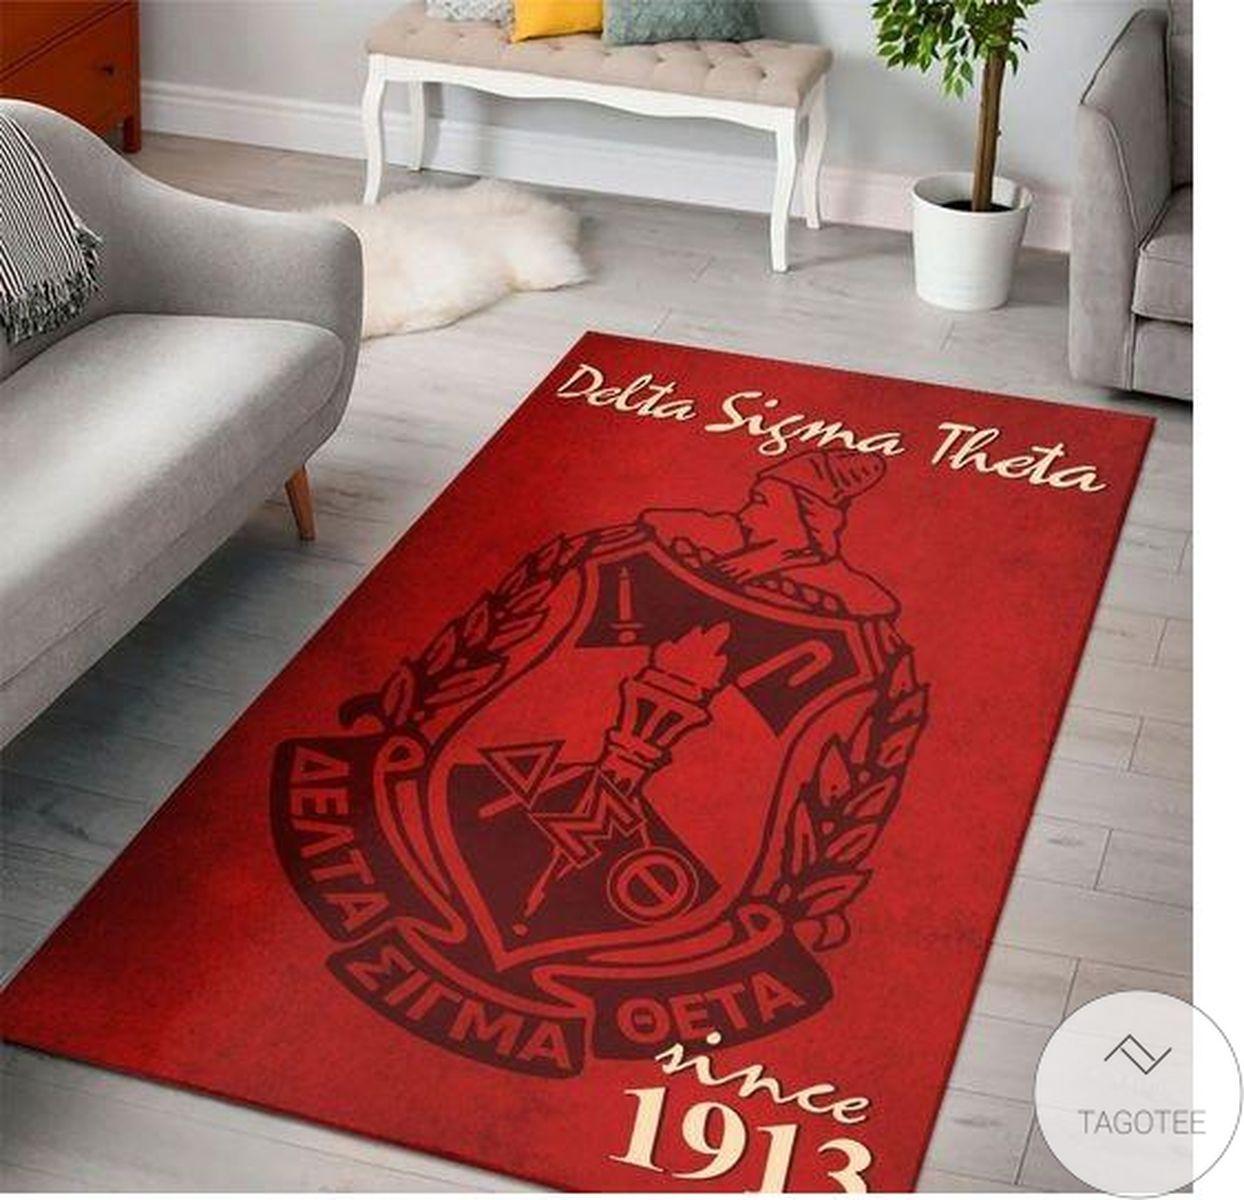 Where To Buy Delta Sigma Theta Since 1913 Soror Inc Crest Crimson Background Rug